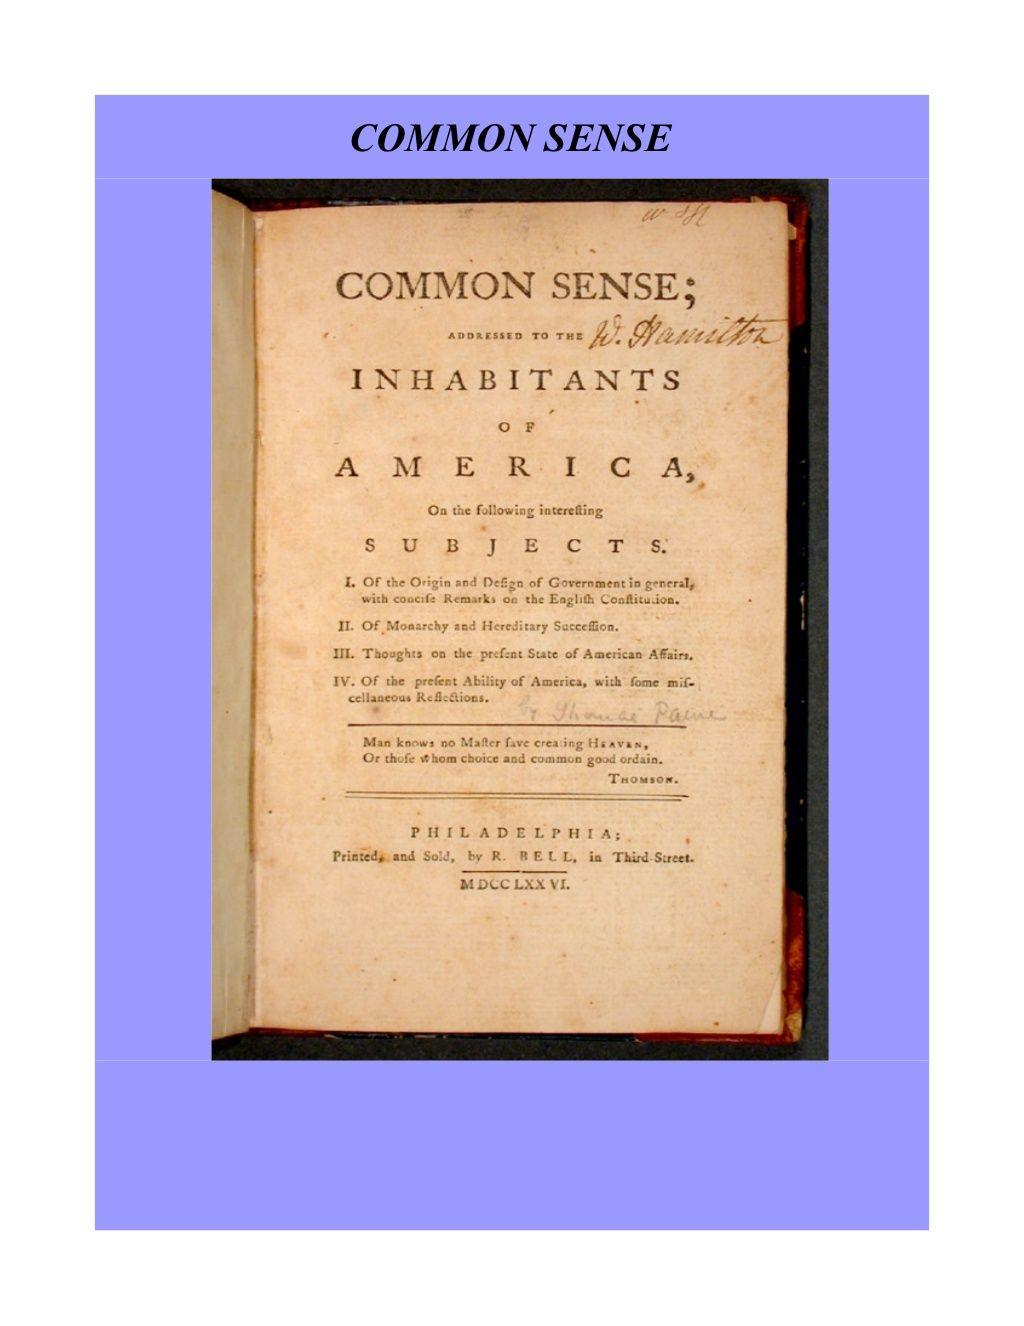 Common Sense Thomas Paine By Chuck Thompson Via Slideshare